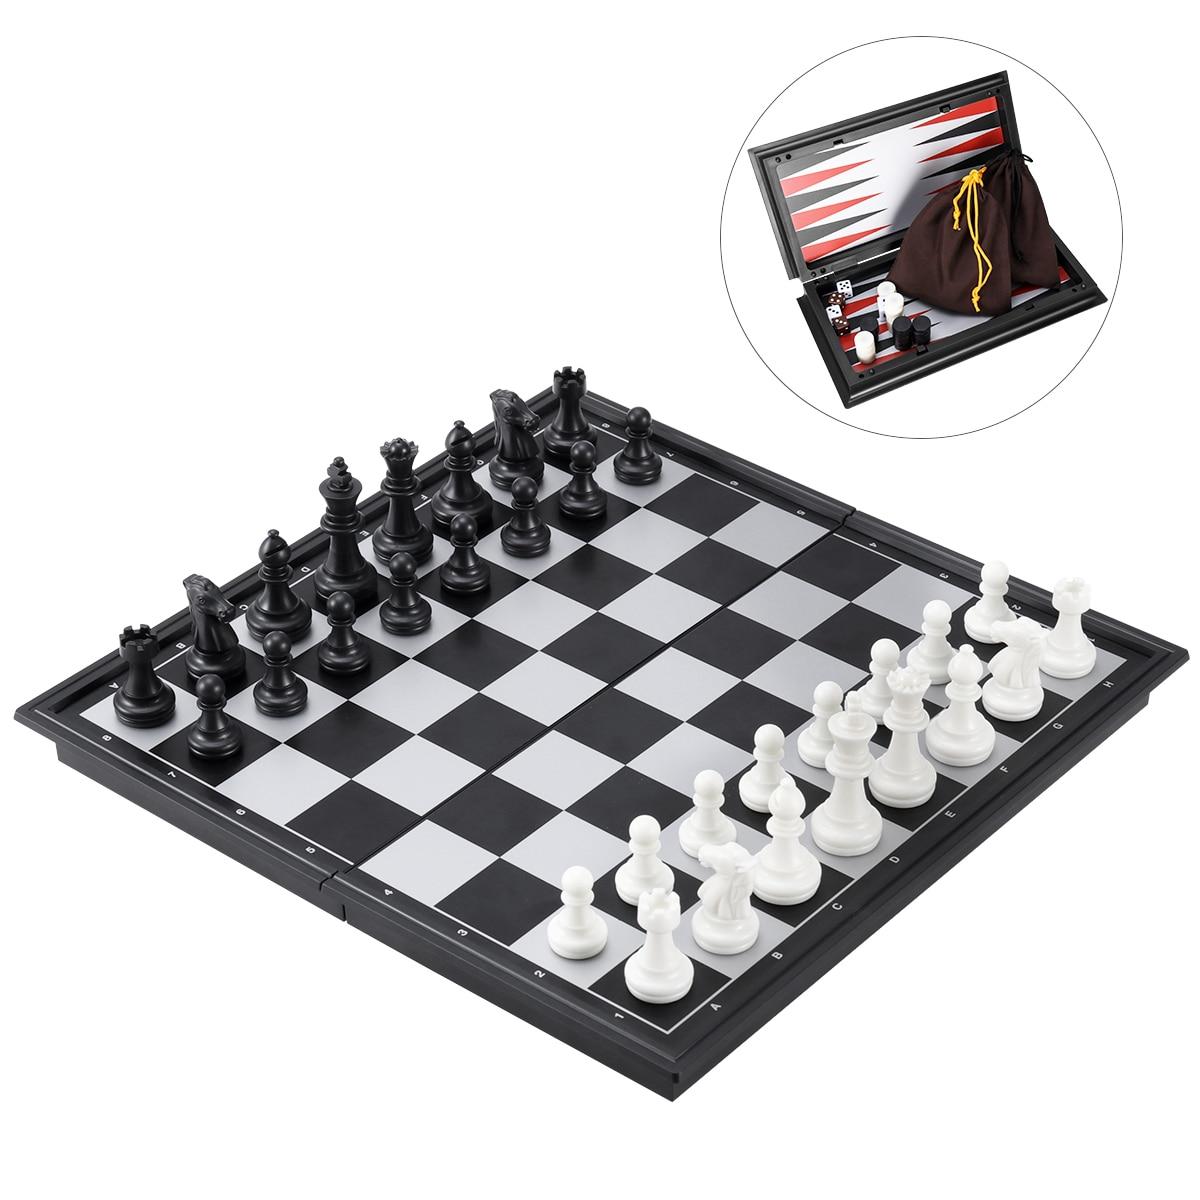 backgammon de plástico de 32 x 32 cm dama Ajedrez magnético ajedrez